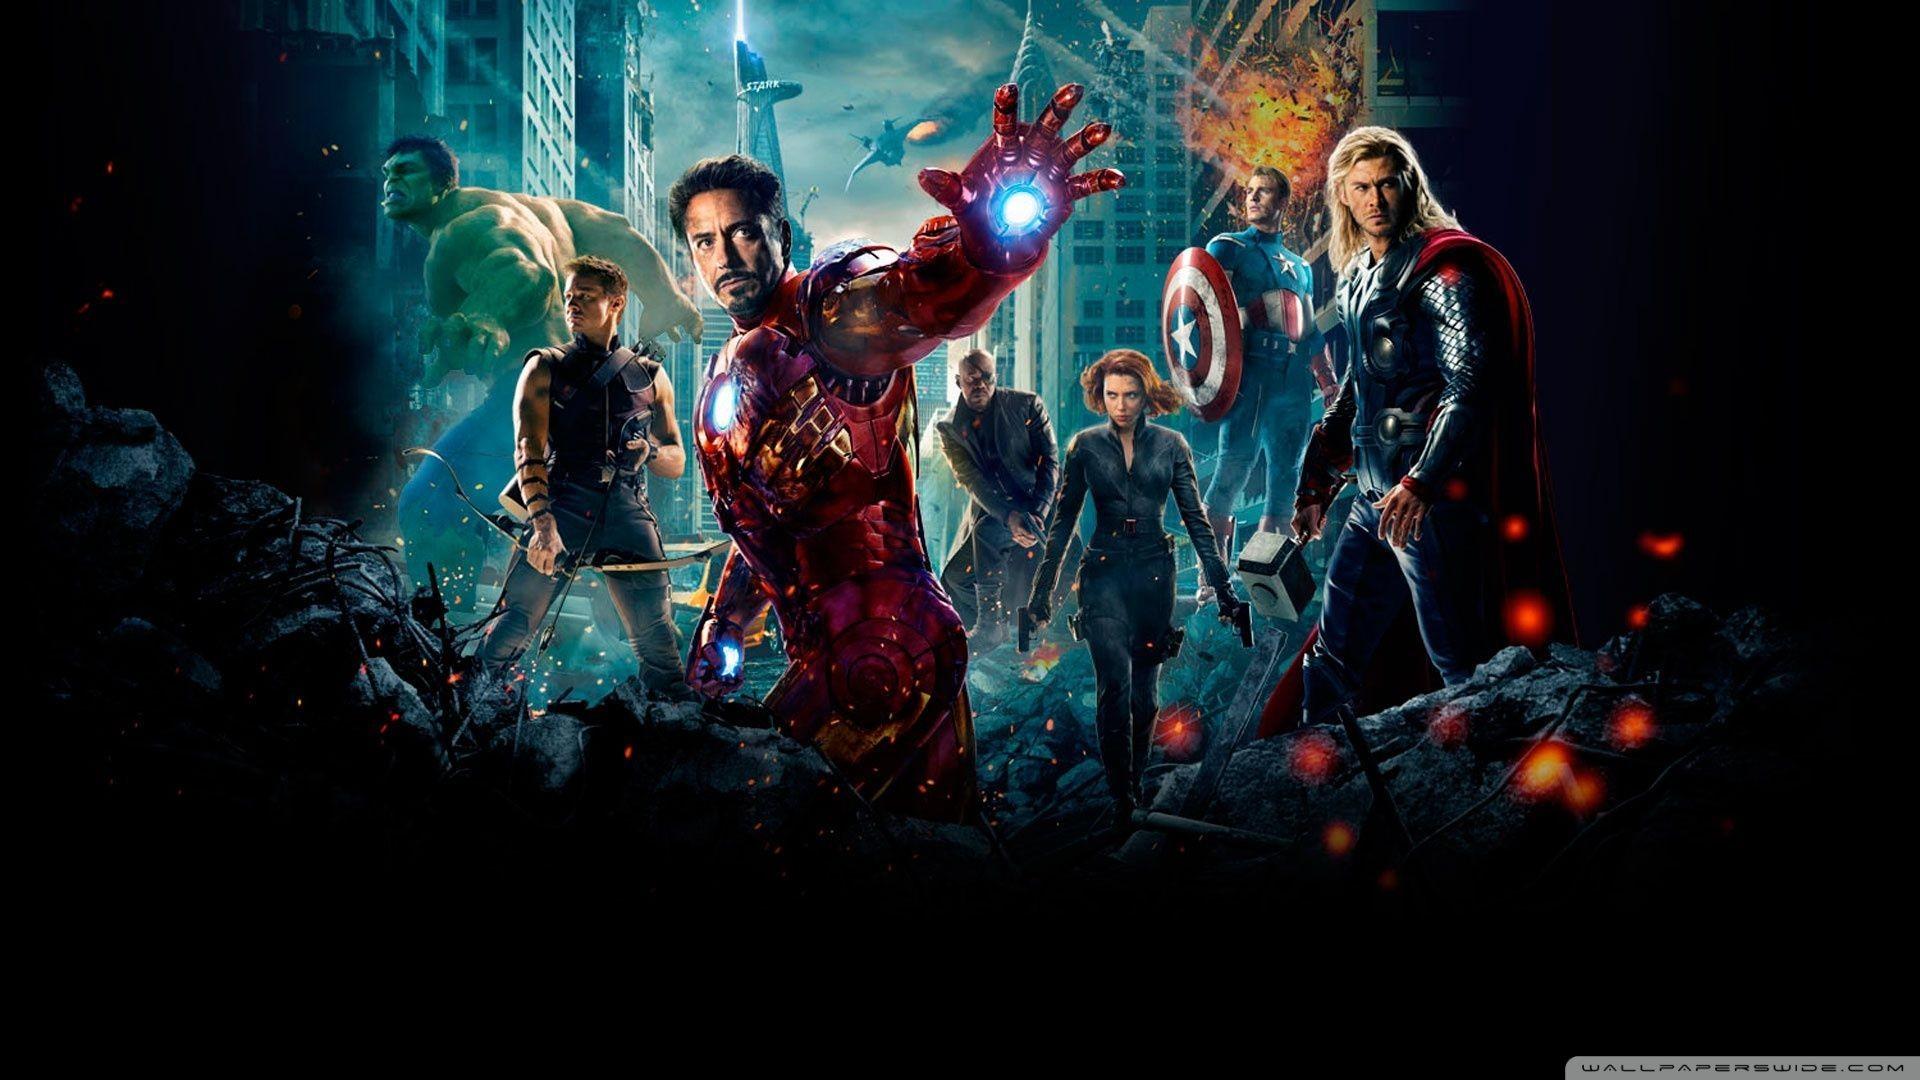 The Avengers Wallpaper HD Avengers HD Live Images HD Wallpapers | HD  Wallpapers | Pinterest | Hd wallpaper and Wallpaper